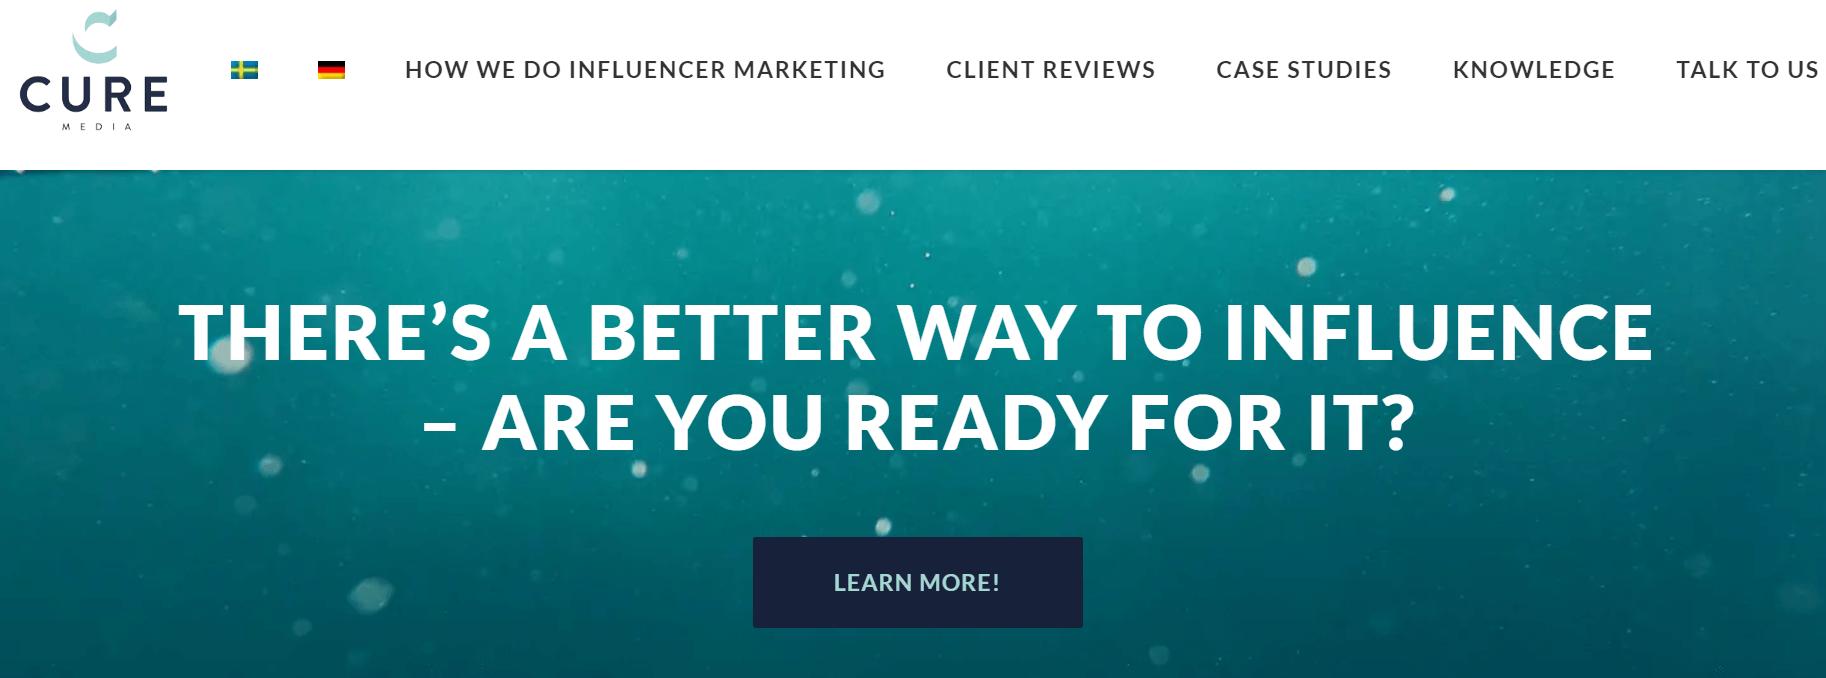 Cure Media Influencer Marketing Agency